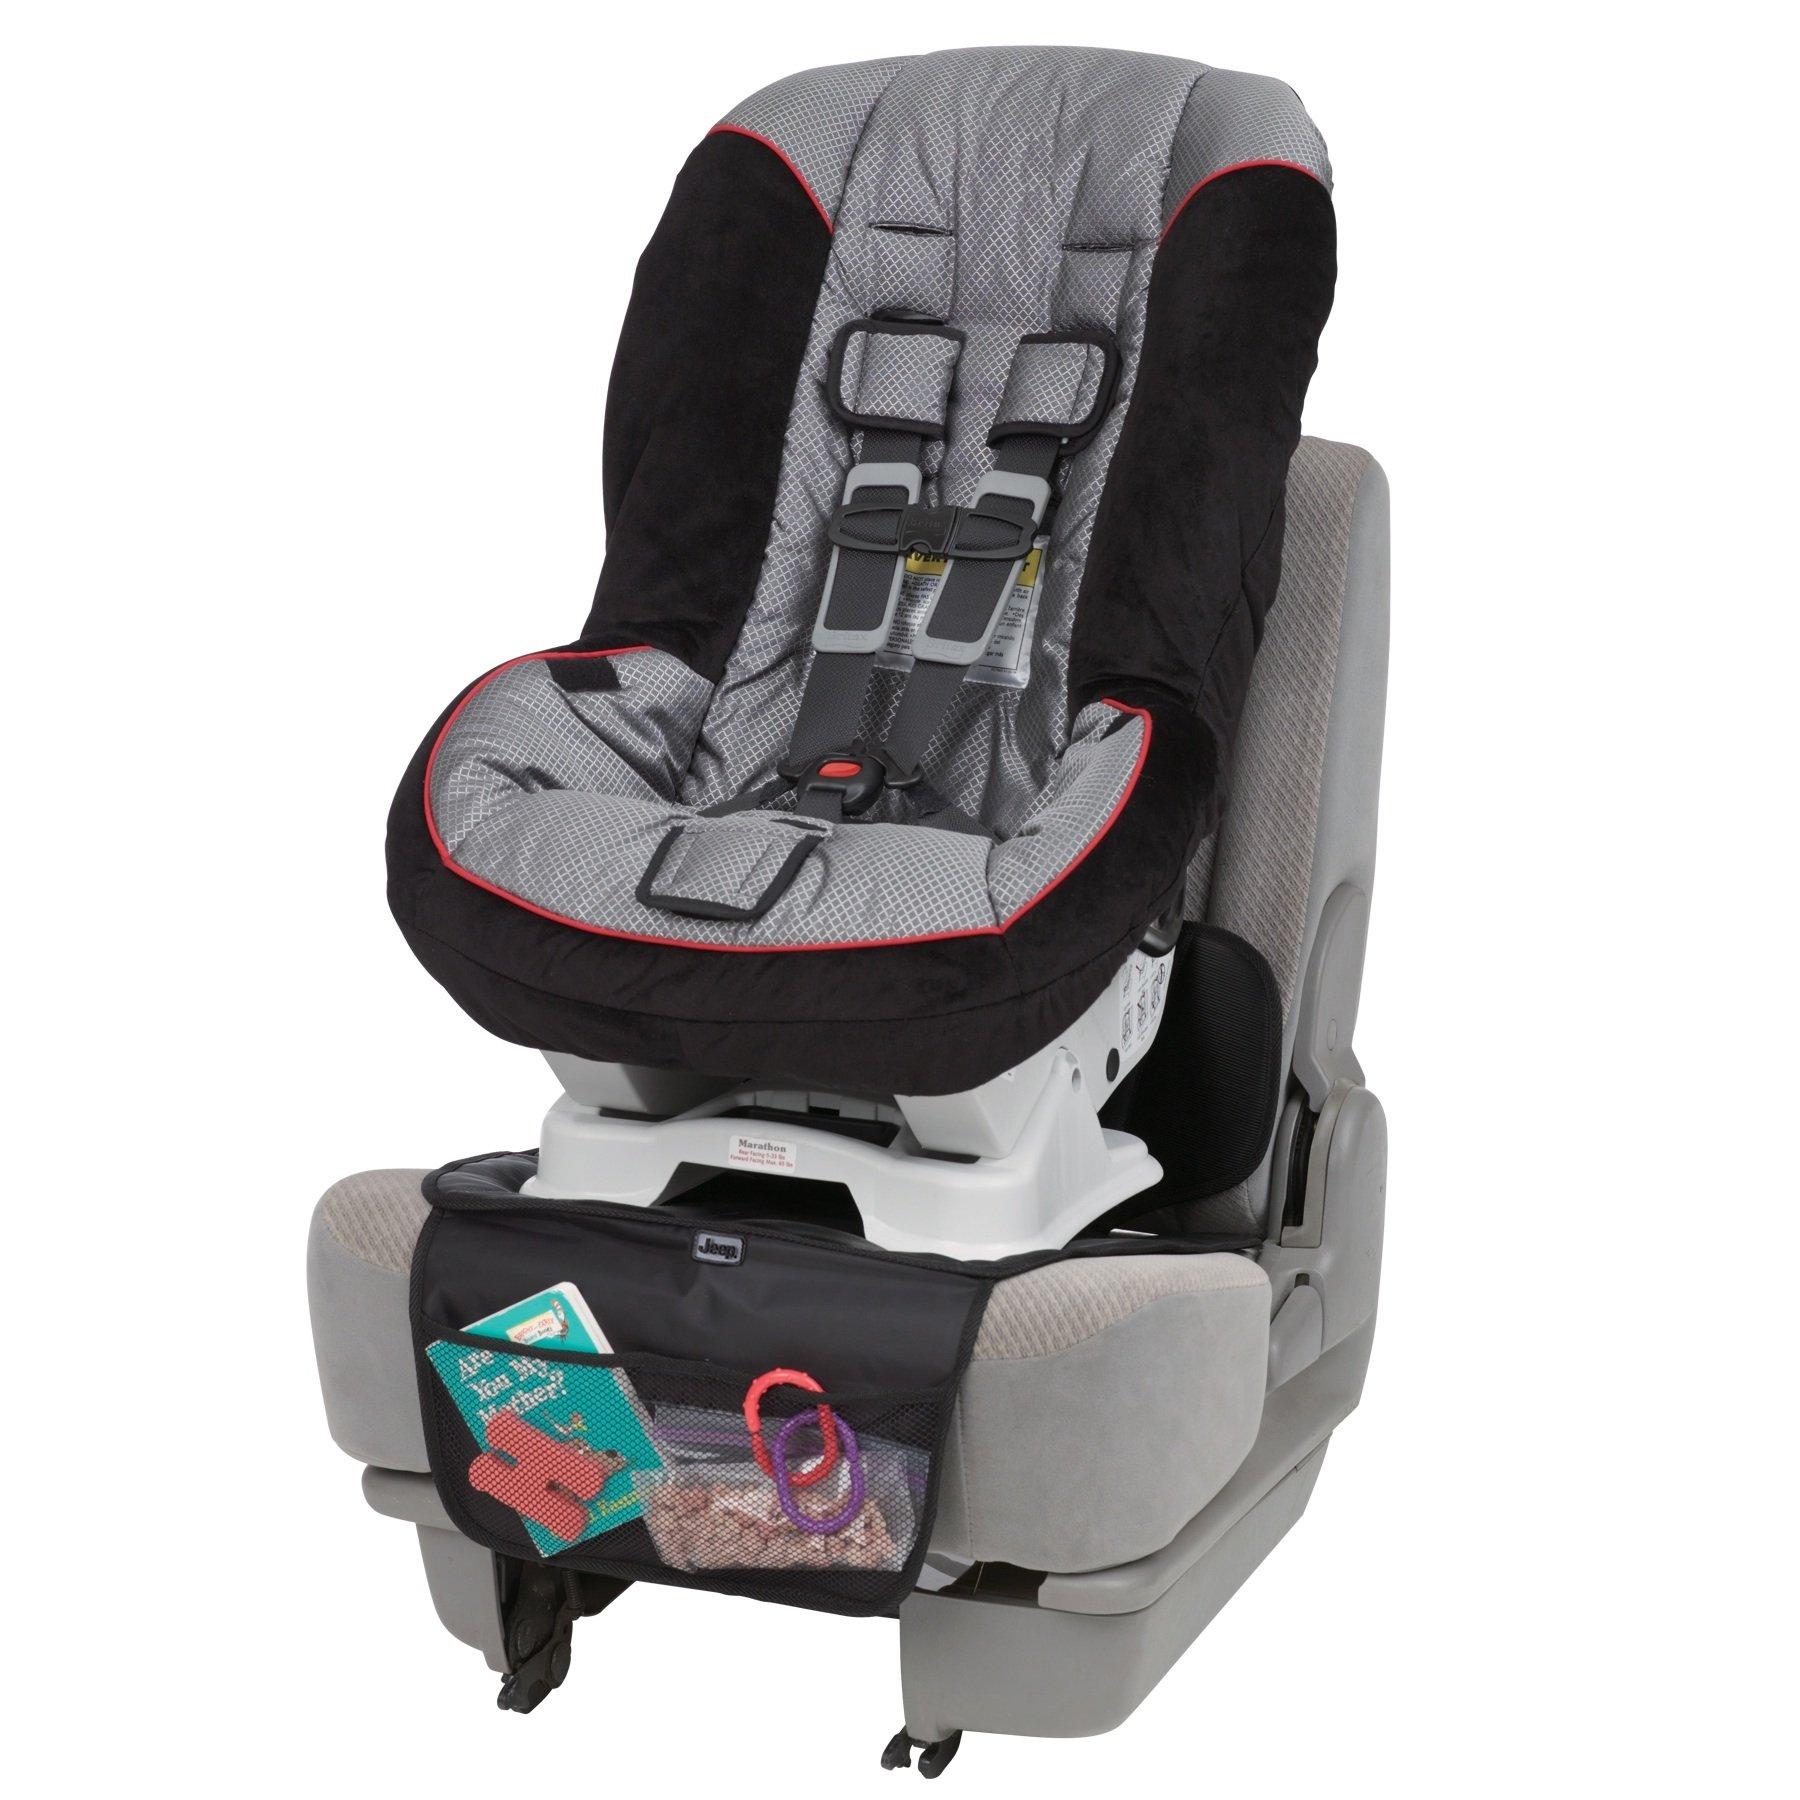 Jeep Car Seat Protector, Black